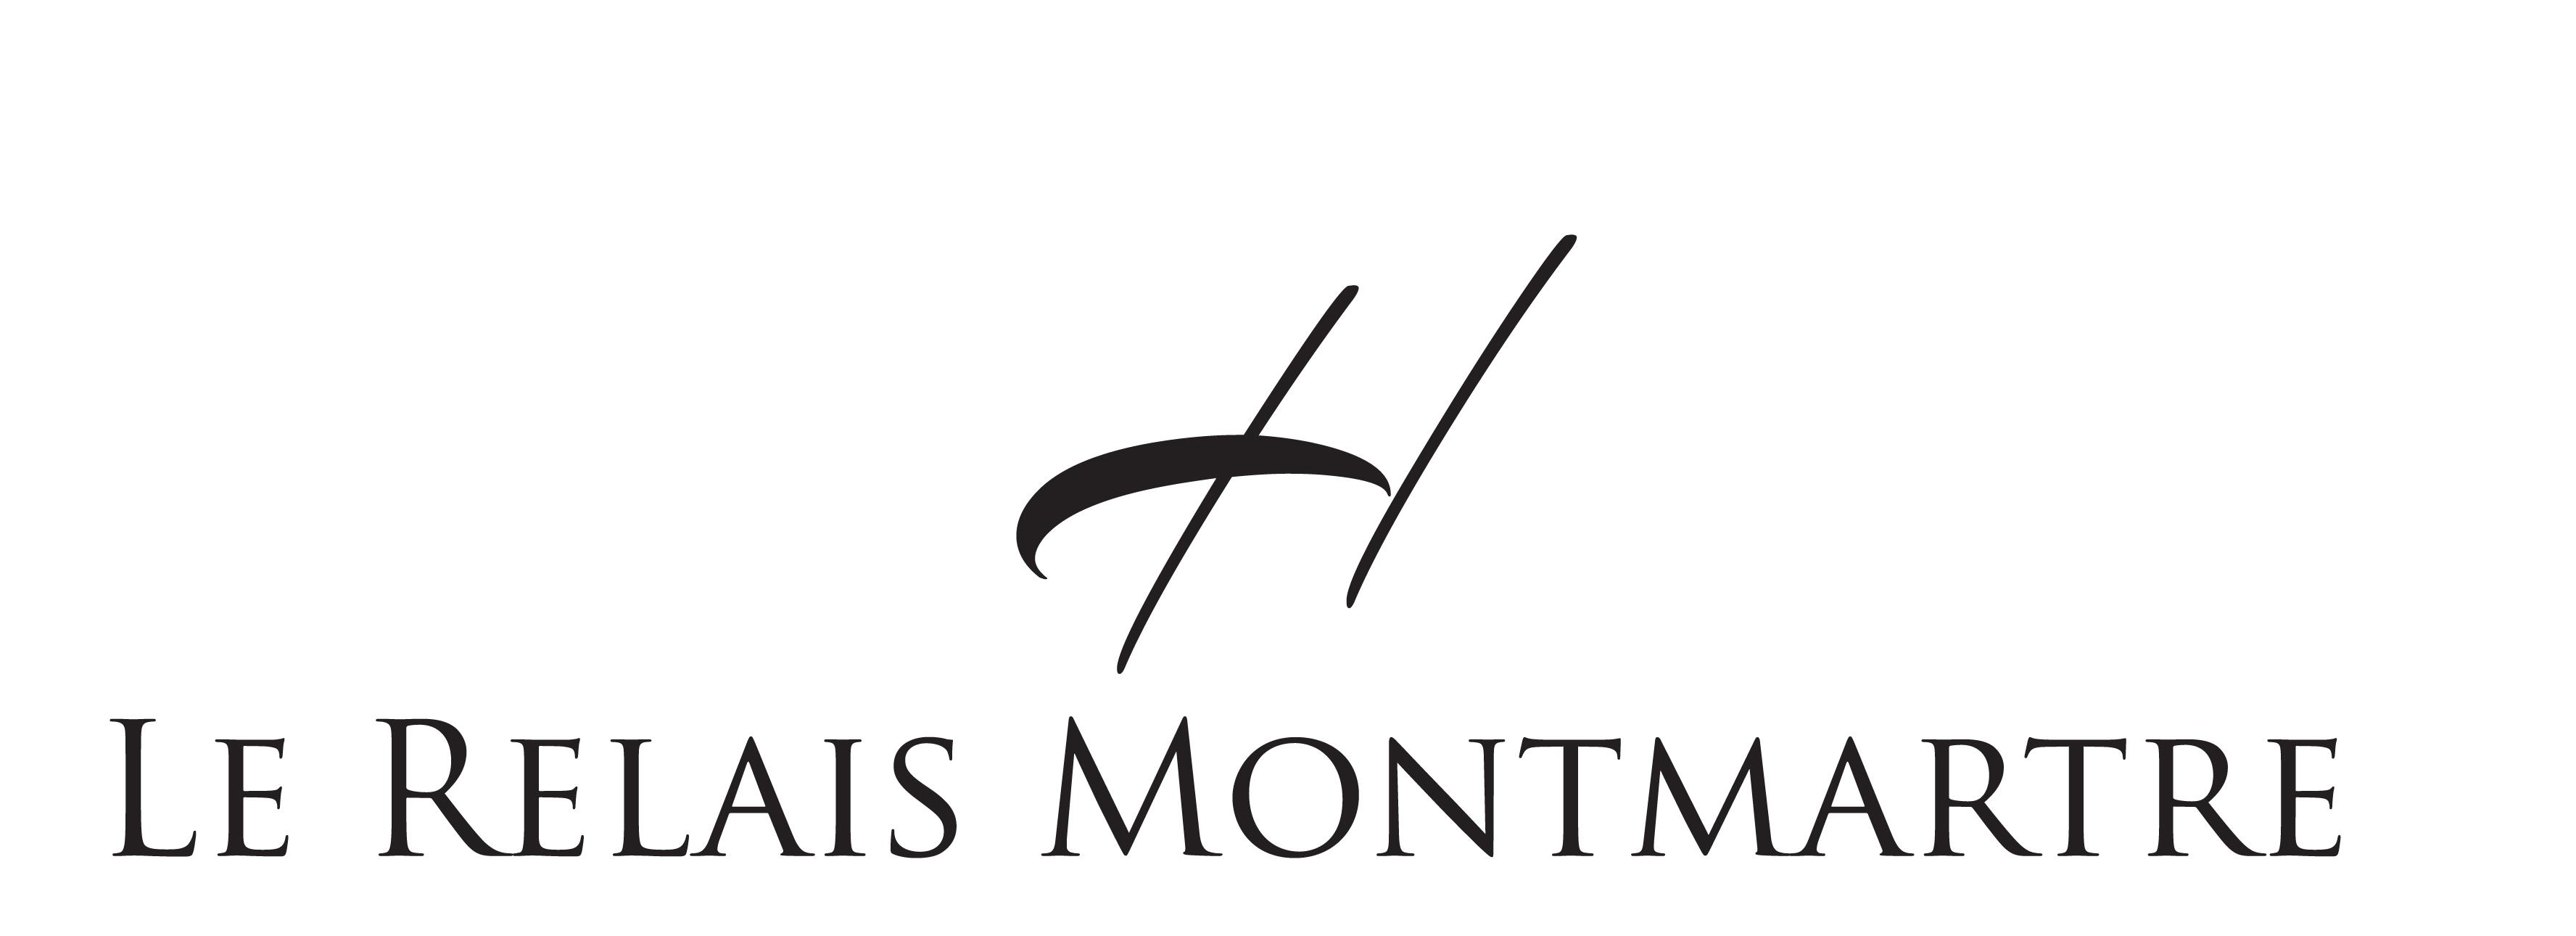 Logo-relais-montmartre Bleu Safran.org Pierre rABHI